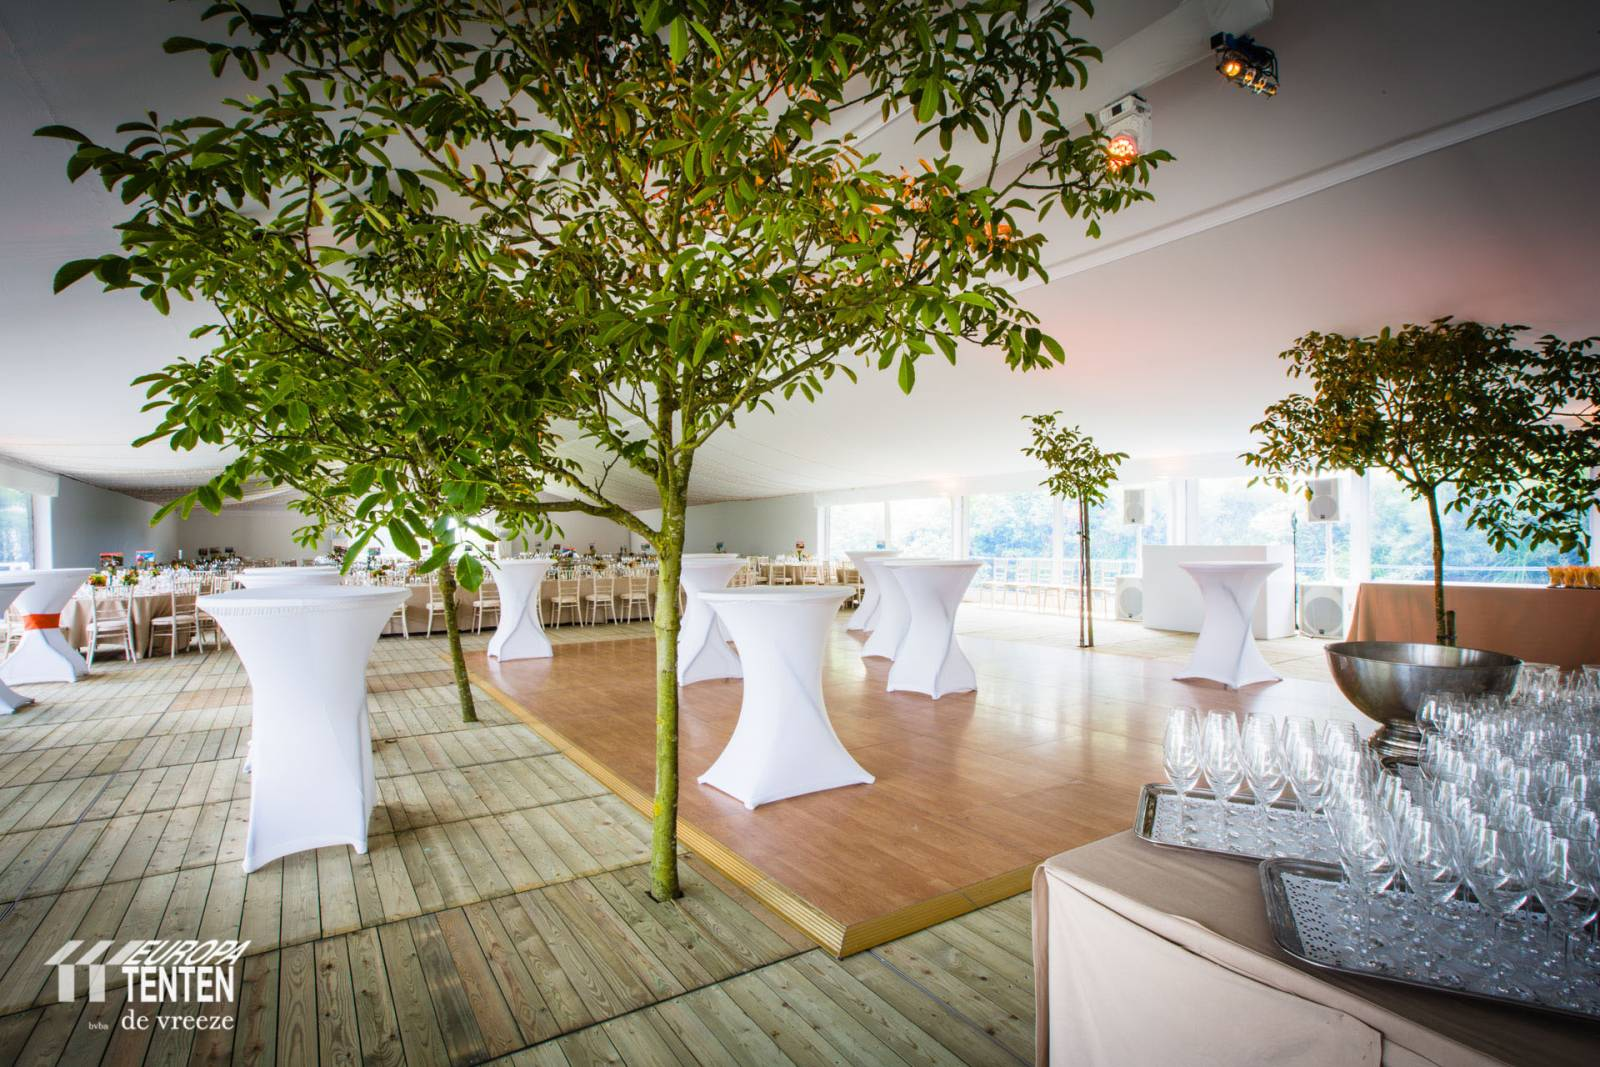 Europatenten 2 - House of Weddings-14